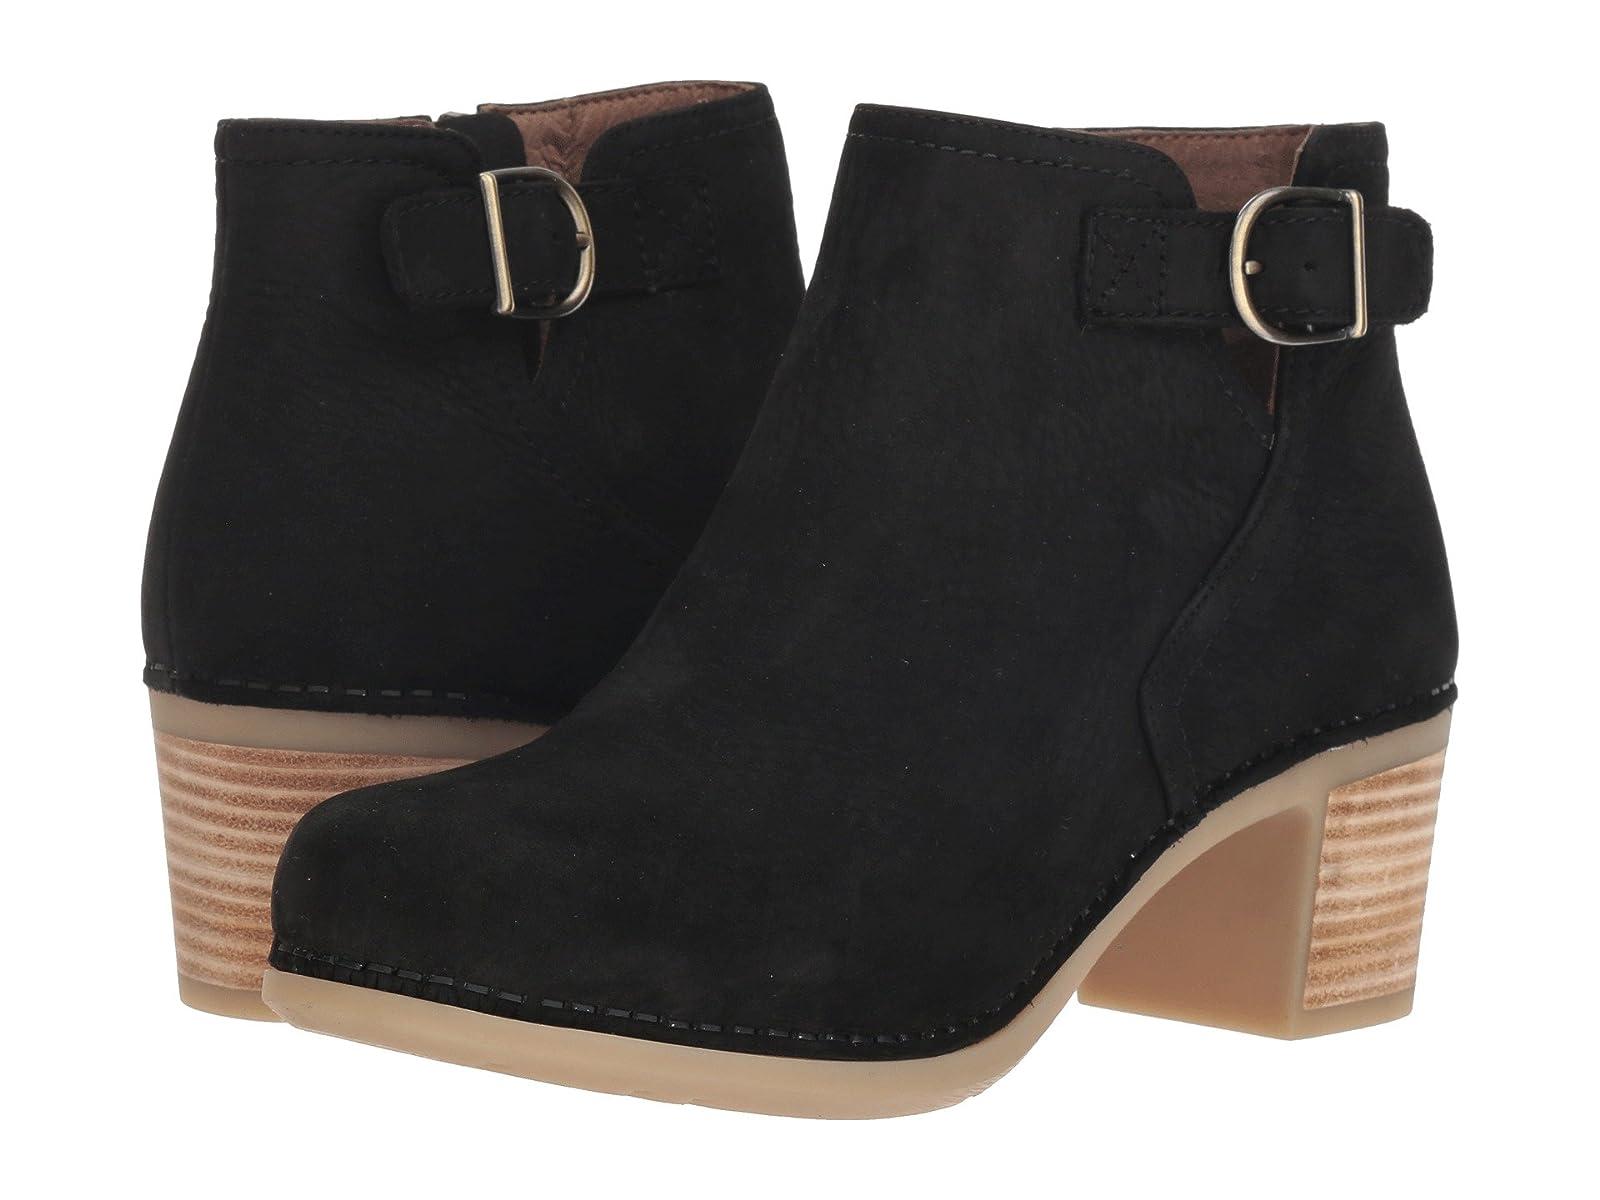 Dansko HenleyAffordable and distinctive shoes